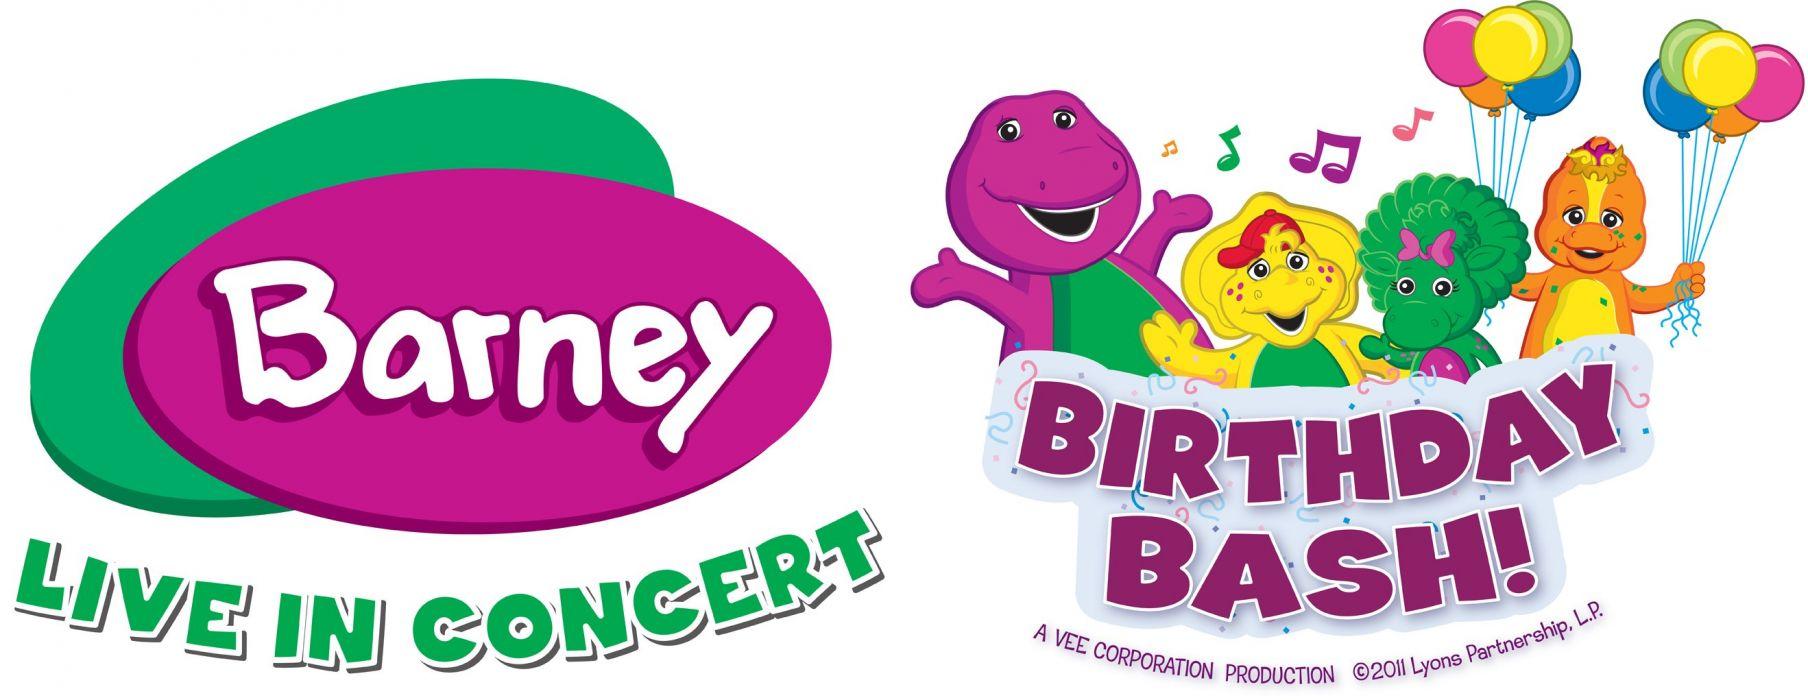 Barney Family Series Adventure Comedy Dinosaur Wallpaper 2637x1021